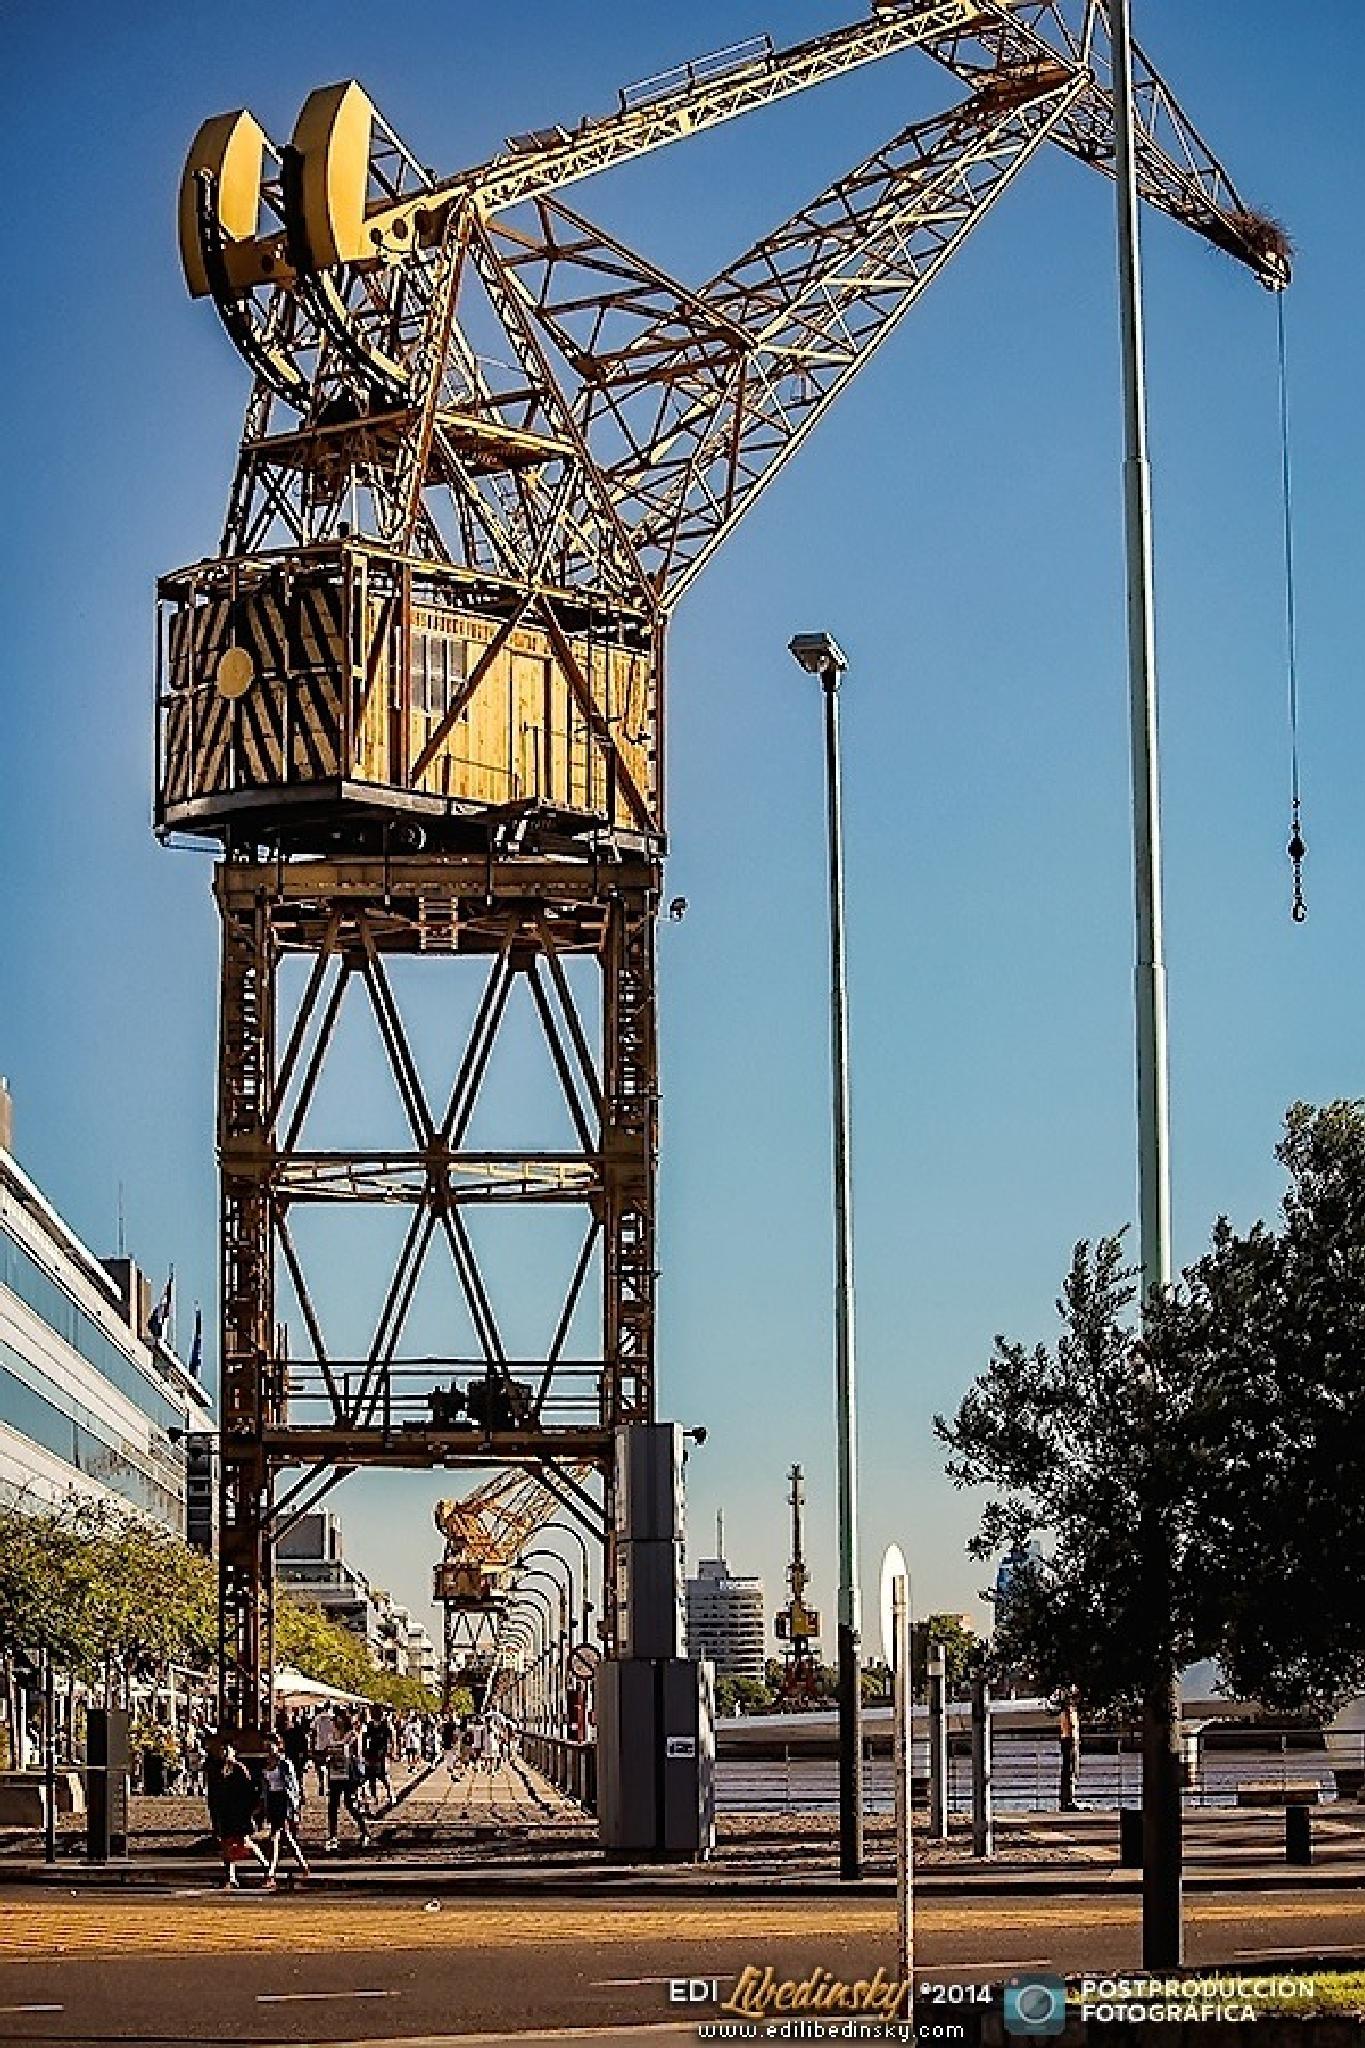 Paseo por el Centro y Pto. Madero @ Edi Libedinsky 2014 by Edi Libedinsky